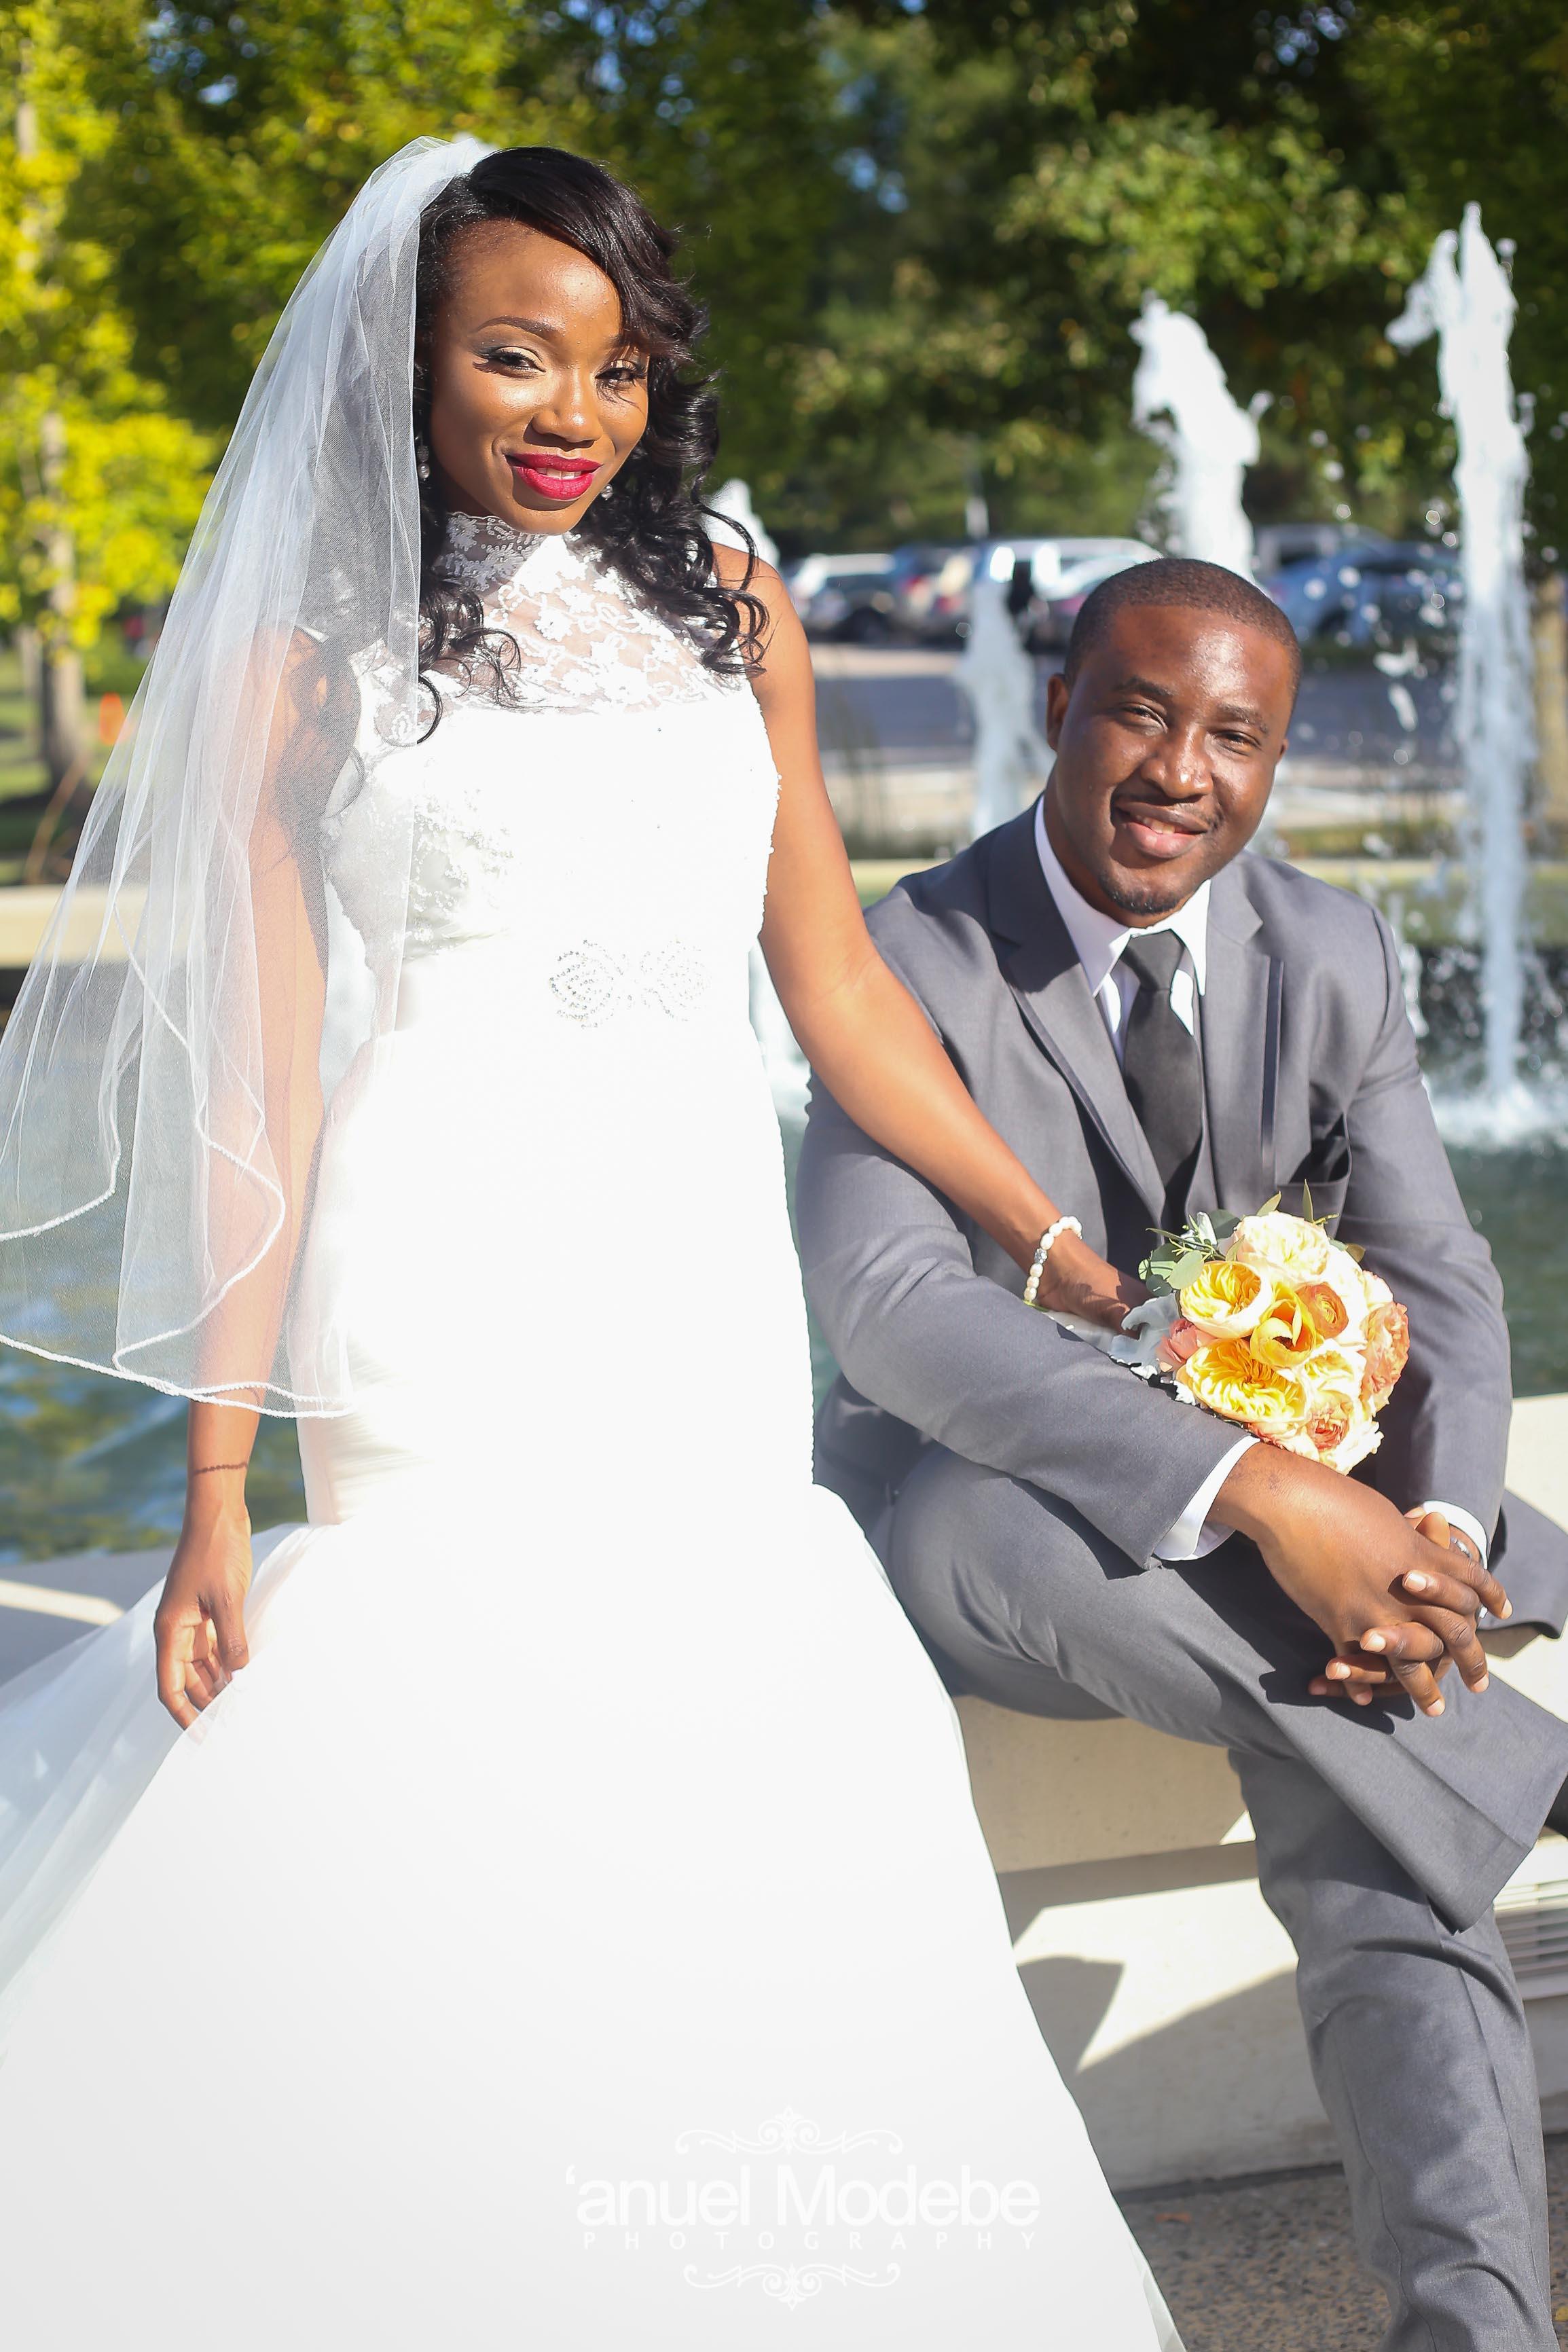 Mr and Mrs Asemota